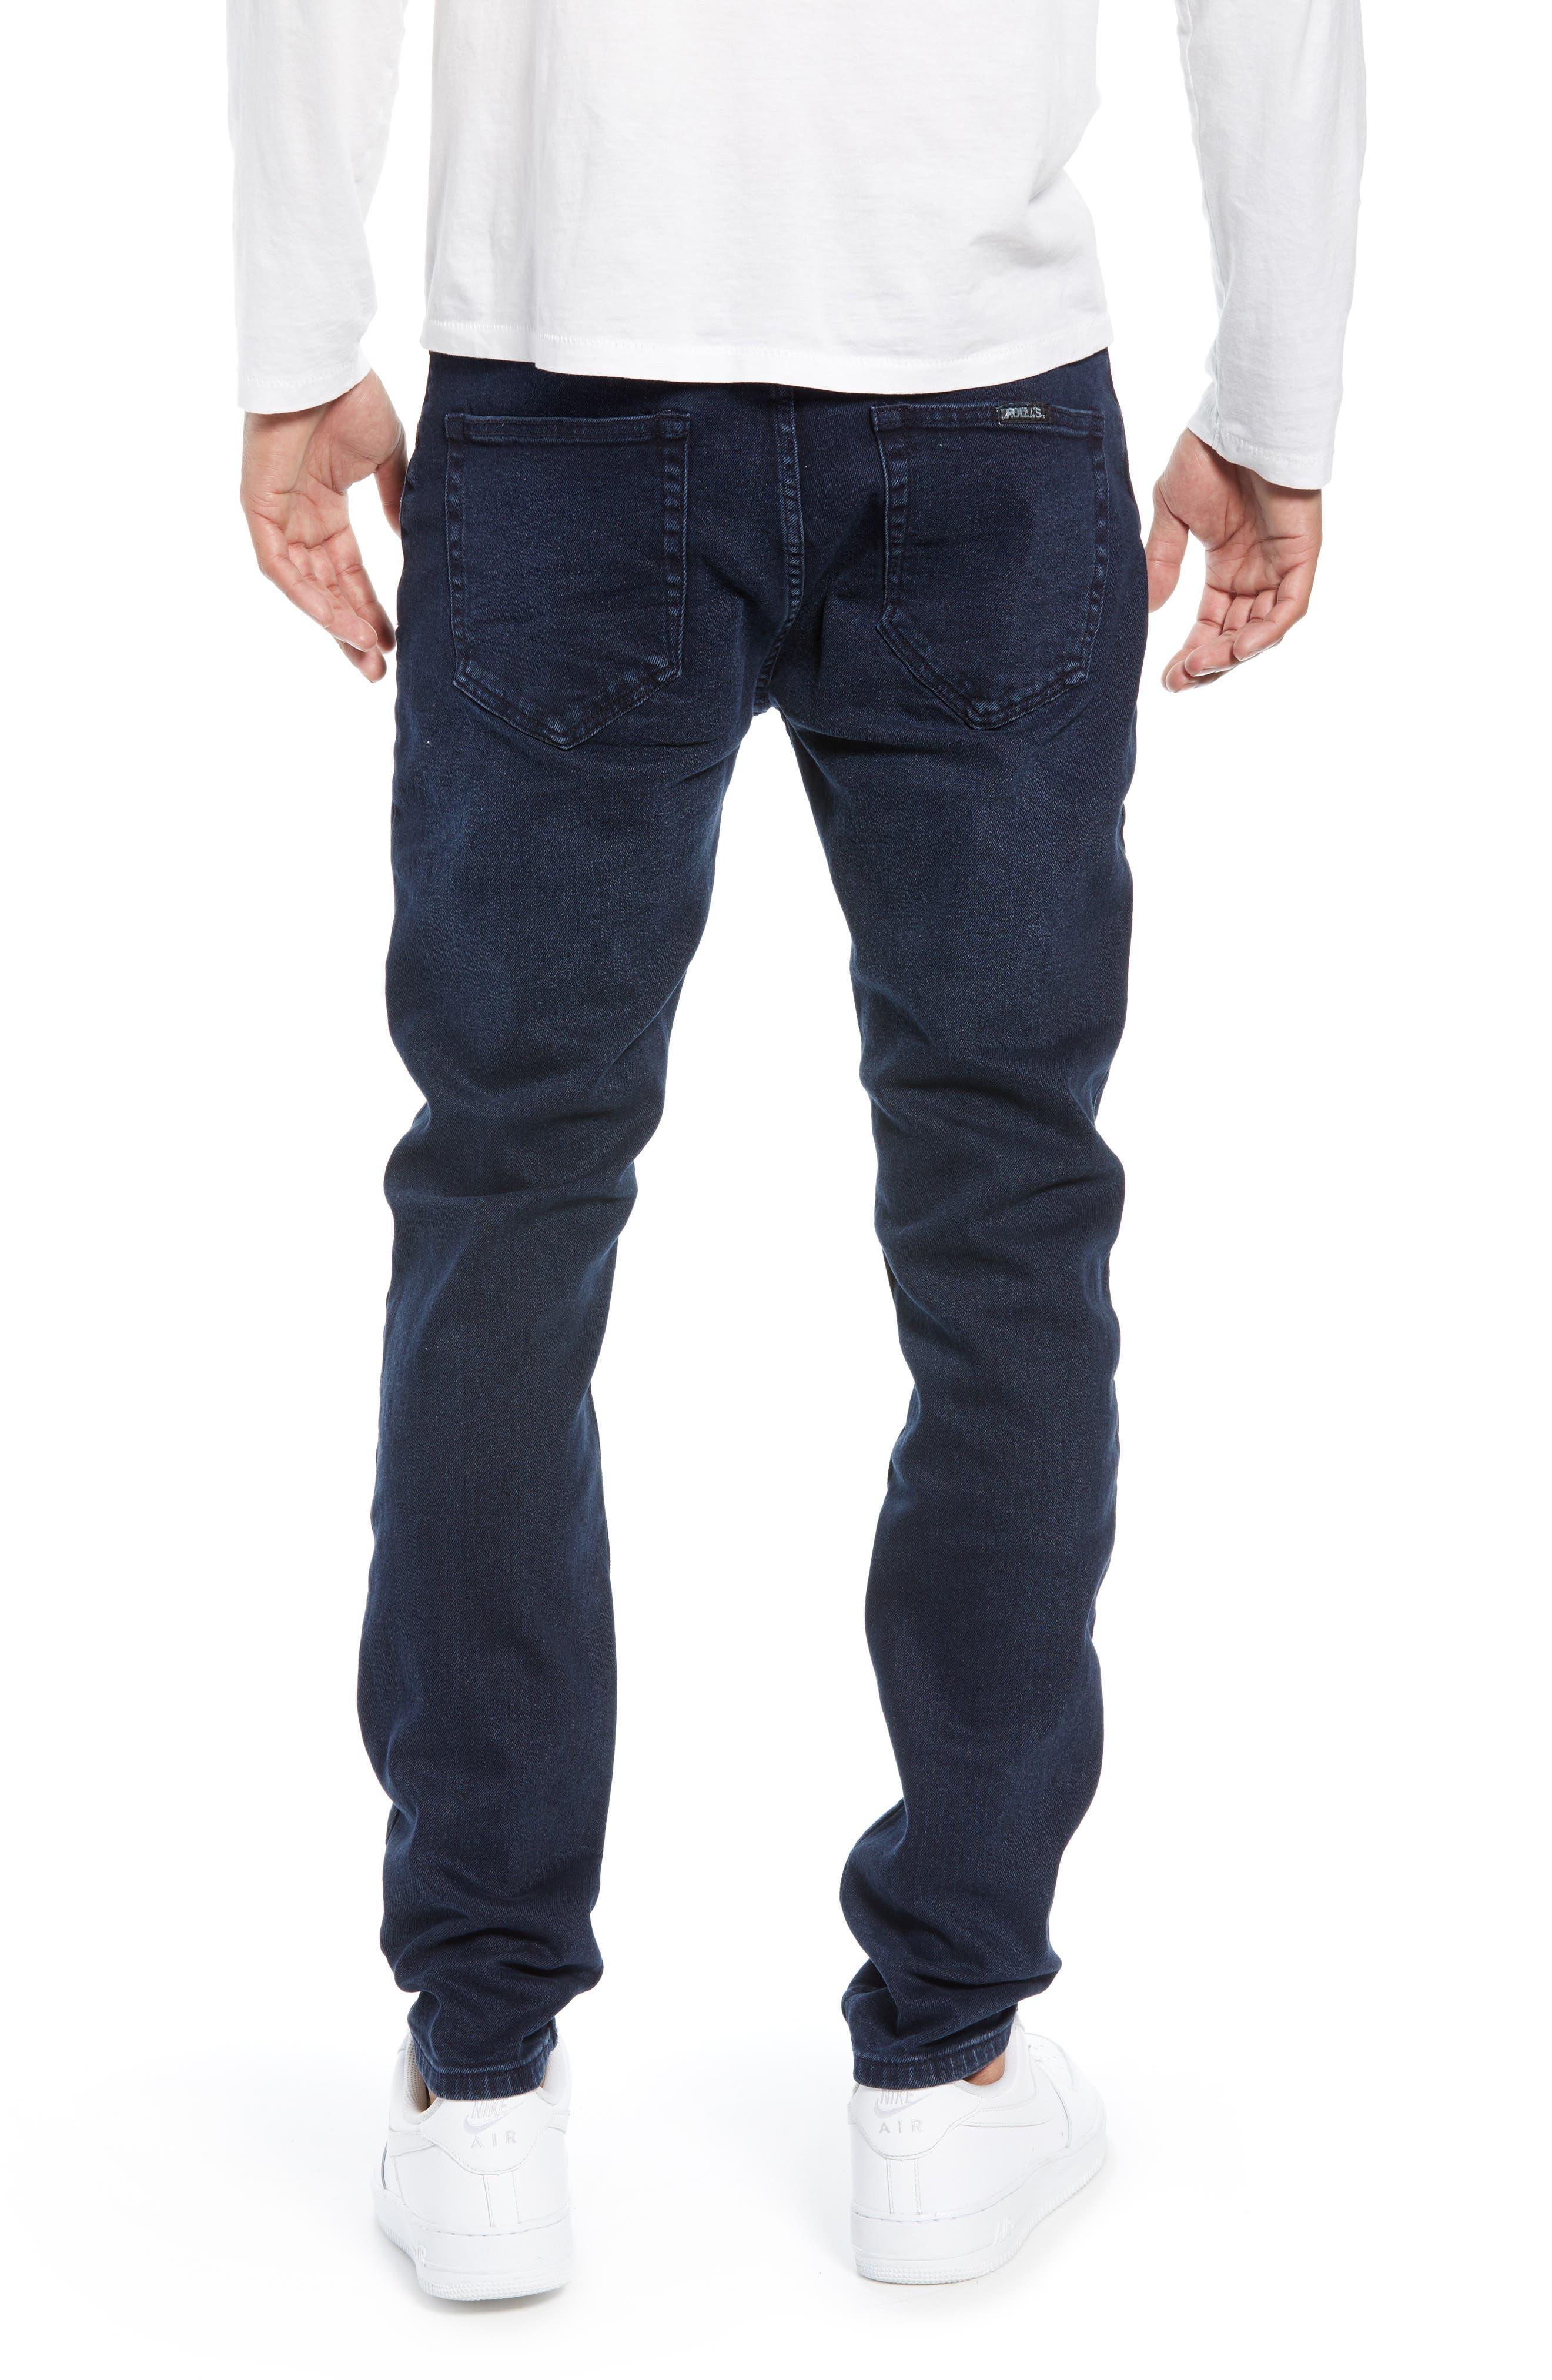 Stinger Skinny Fit Jeans,                             Alternate thumbnail 2, color,                             STONE FREE BLUE